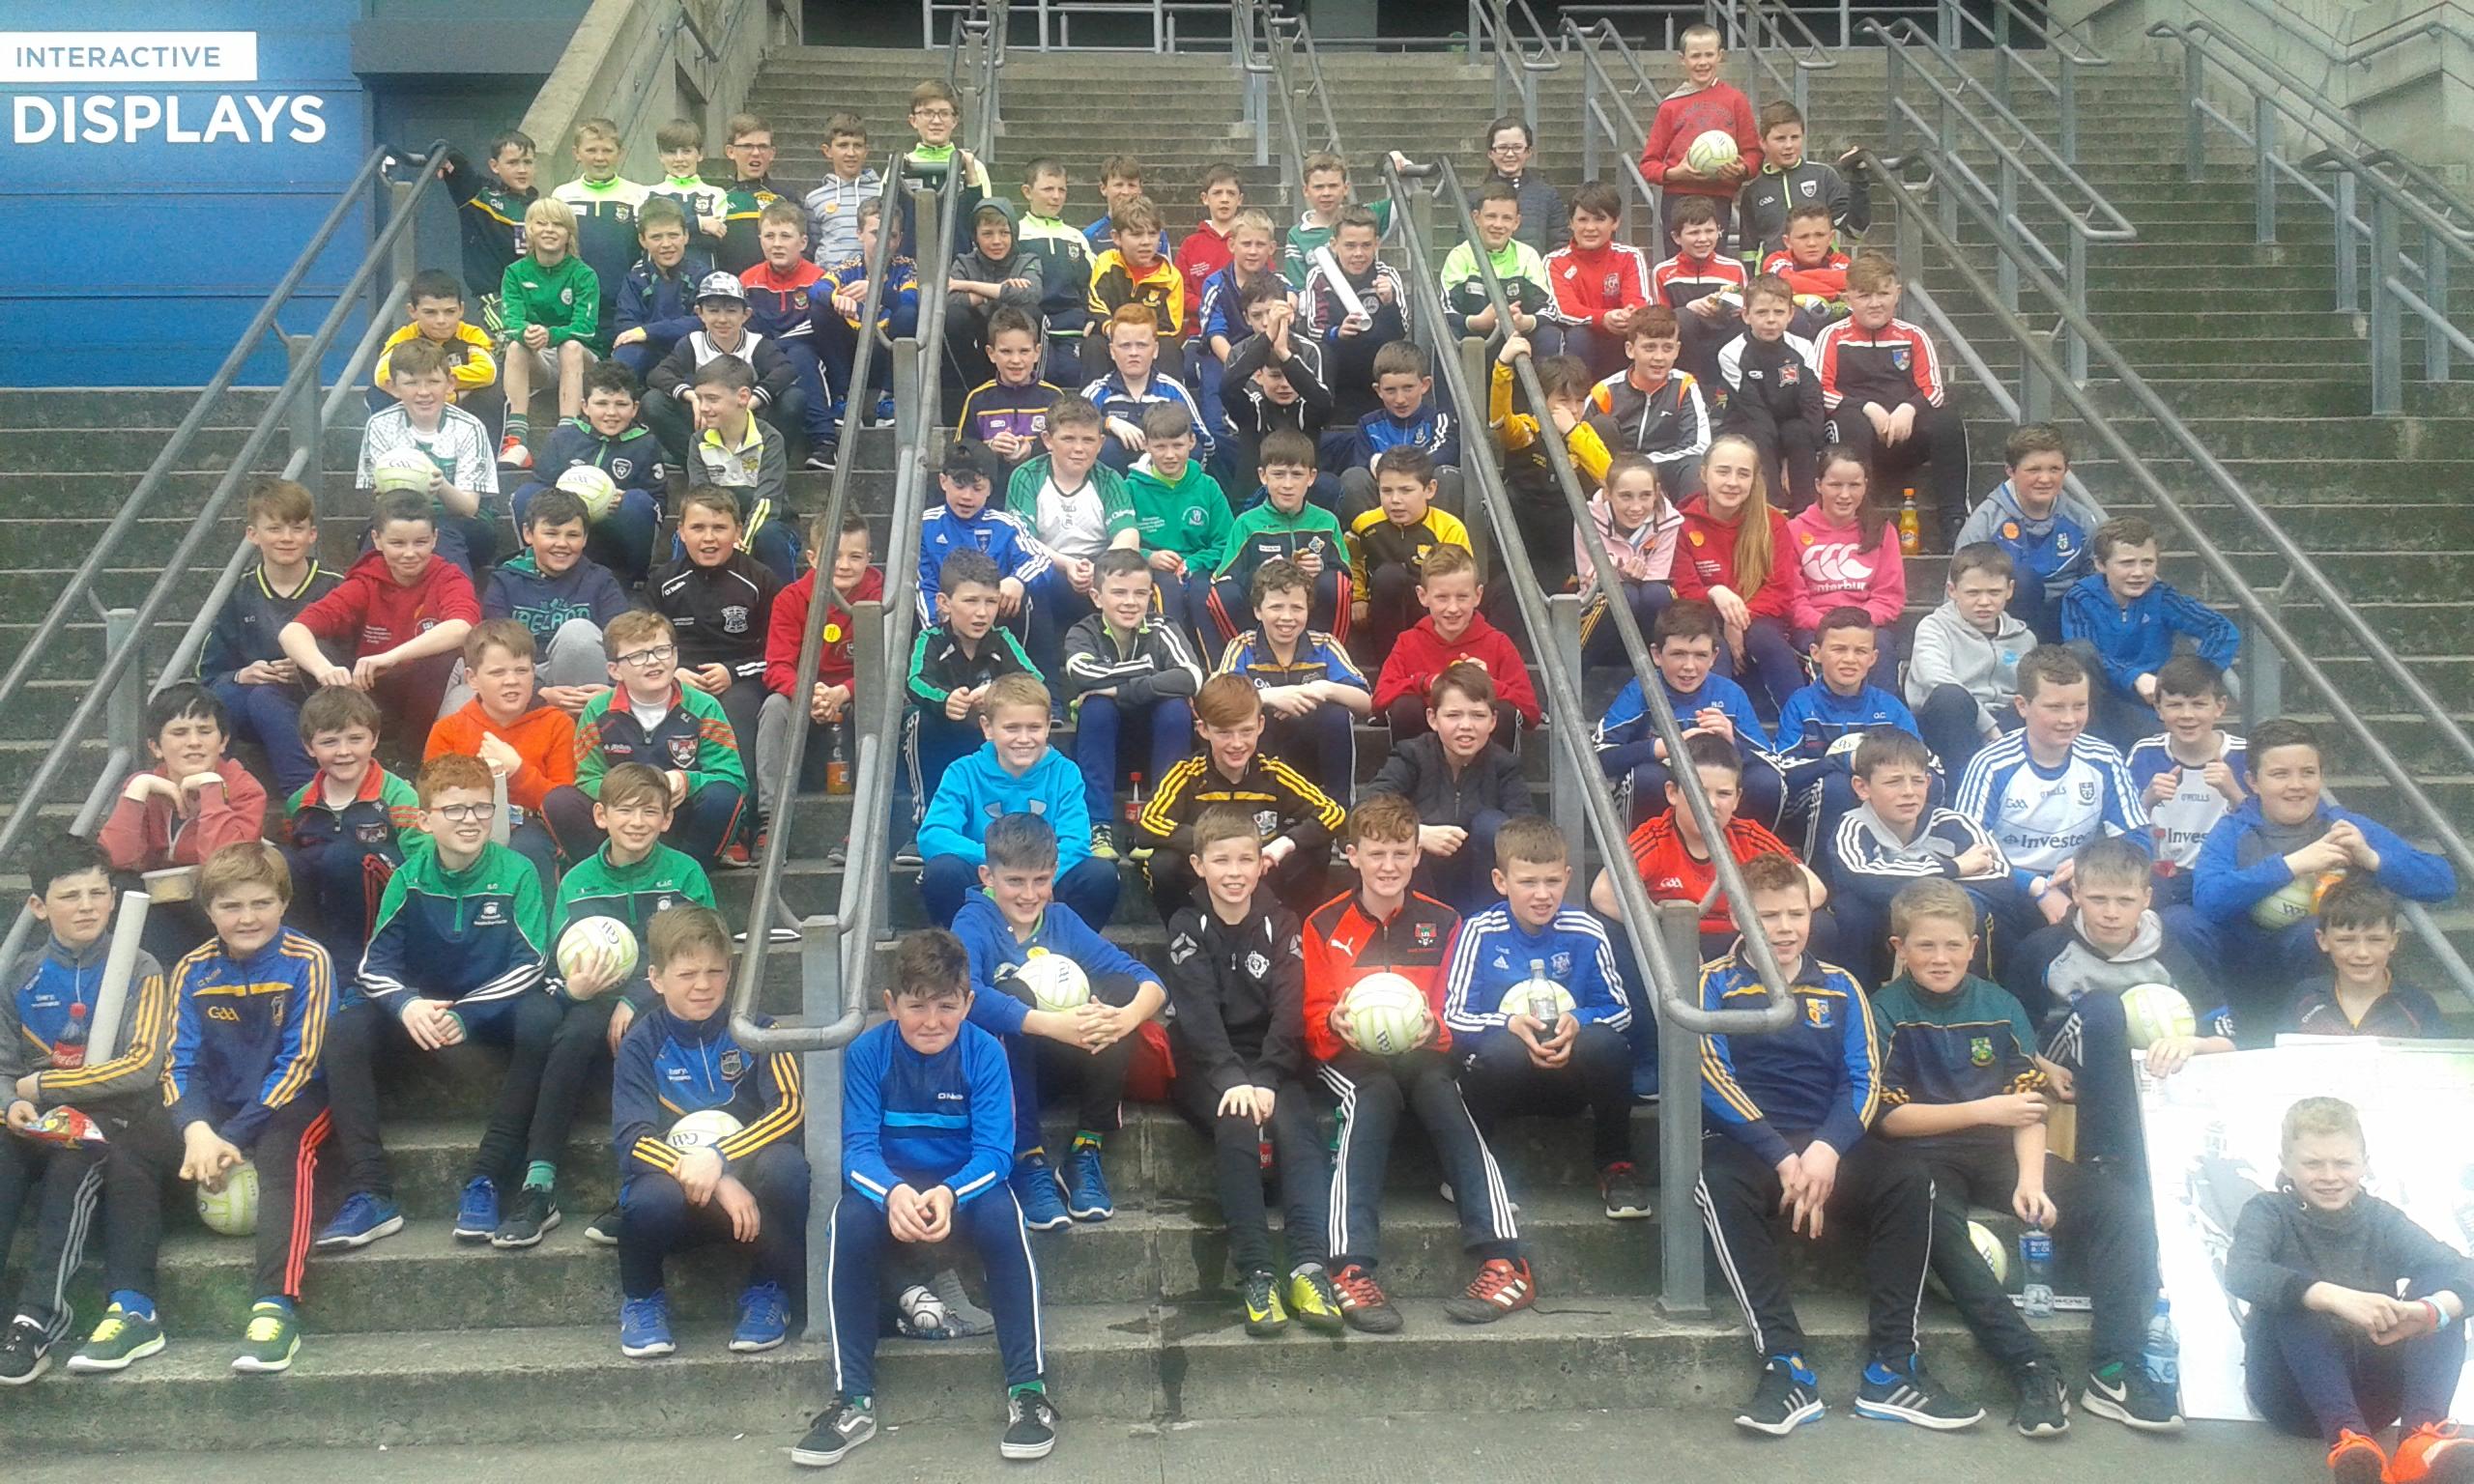 Monaghan GAA Go Games Day 2017